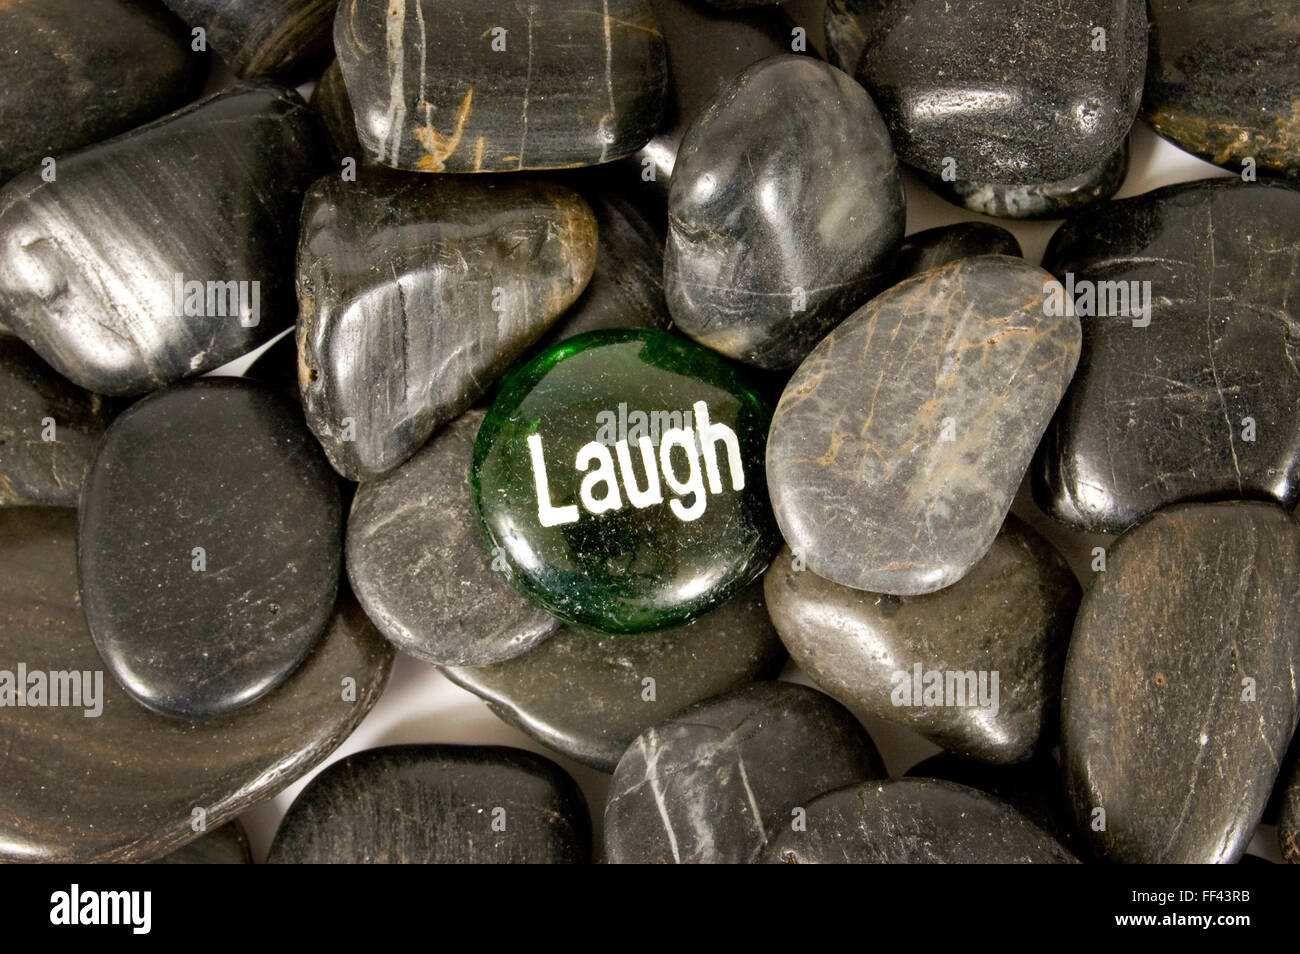 Laugh Encouragement Stone - Stock Image